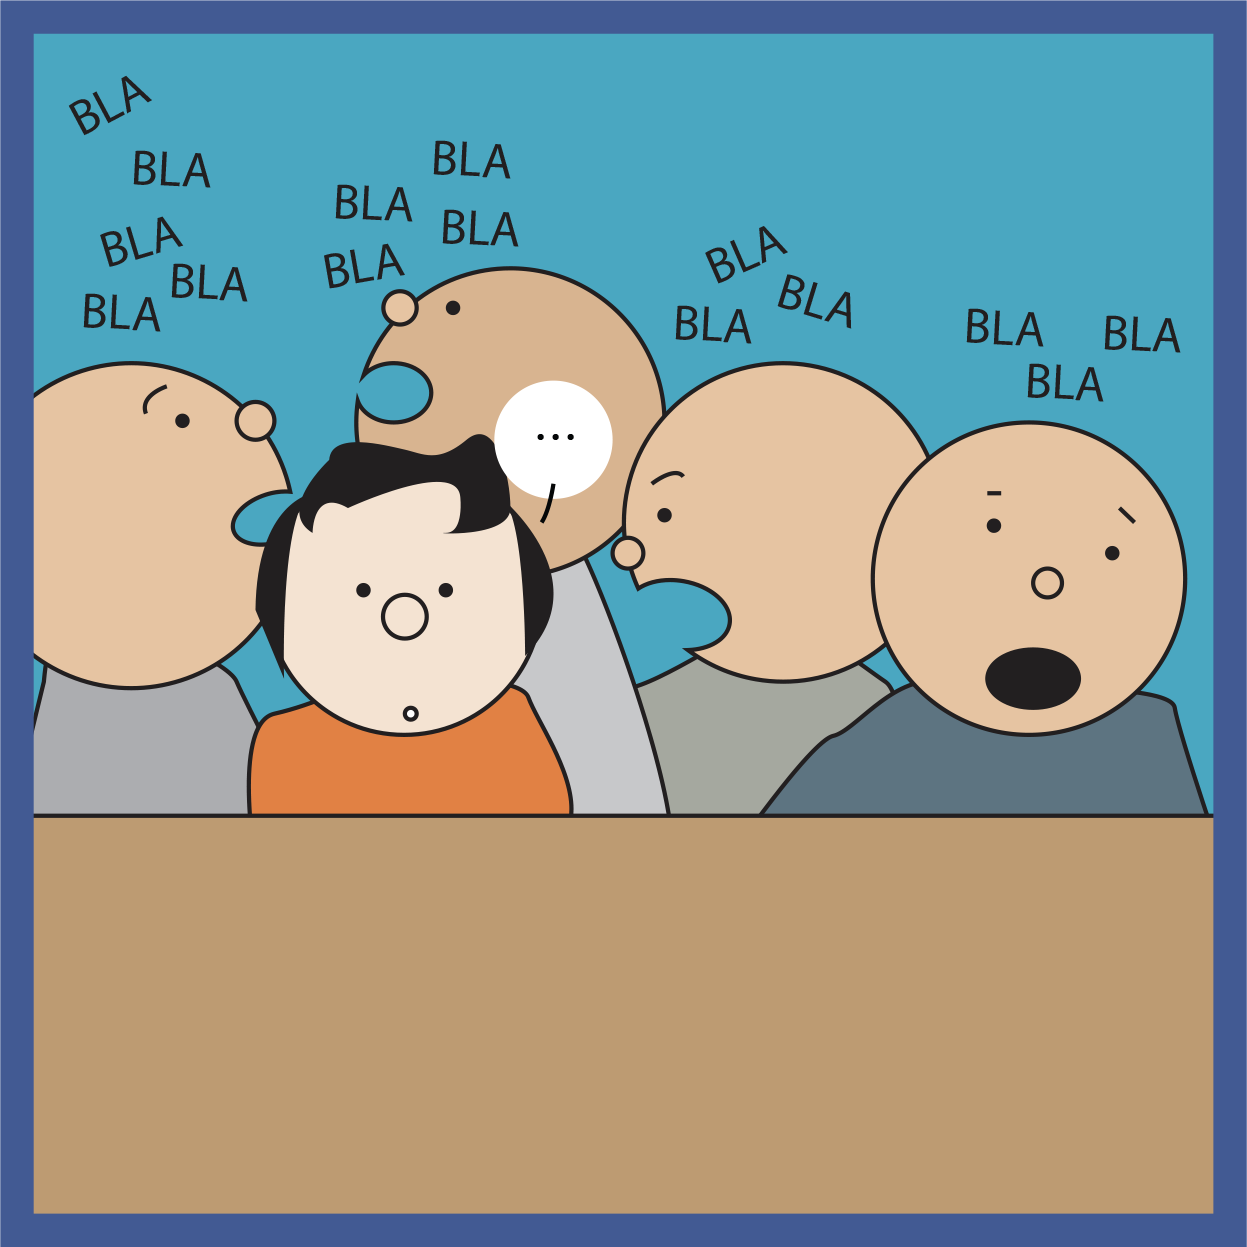 [Cartoon] L'assertivité, ça se travaille à l'EAP